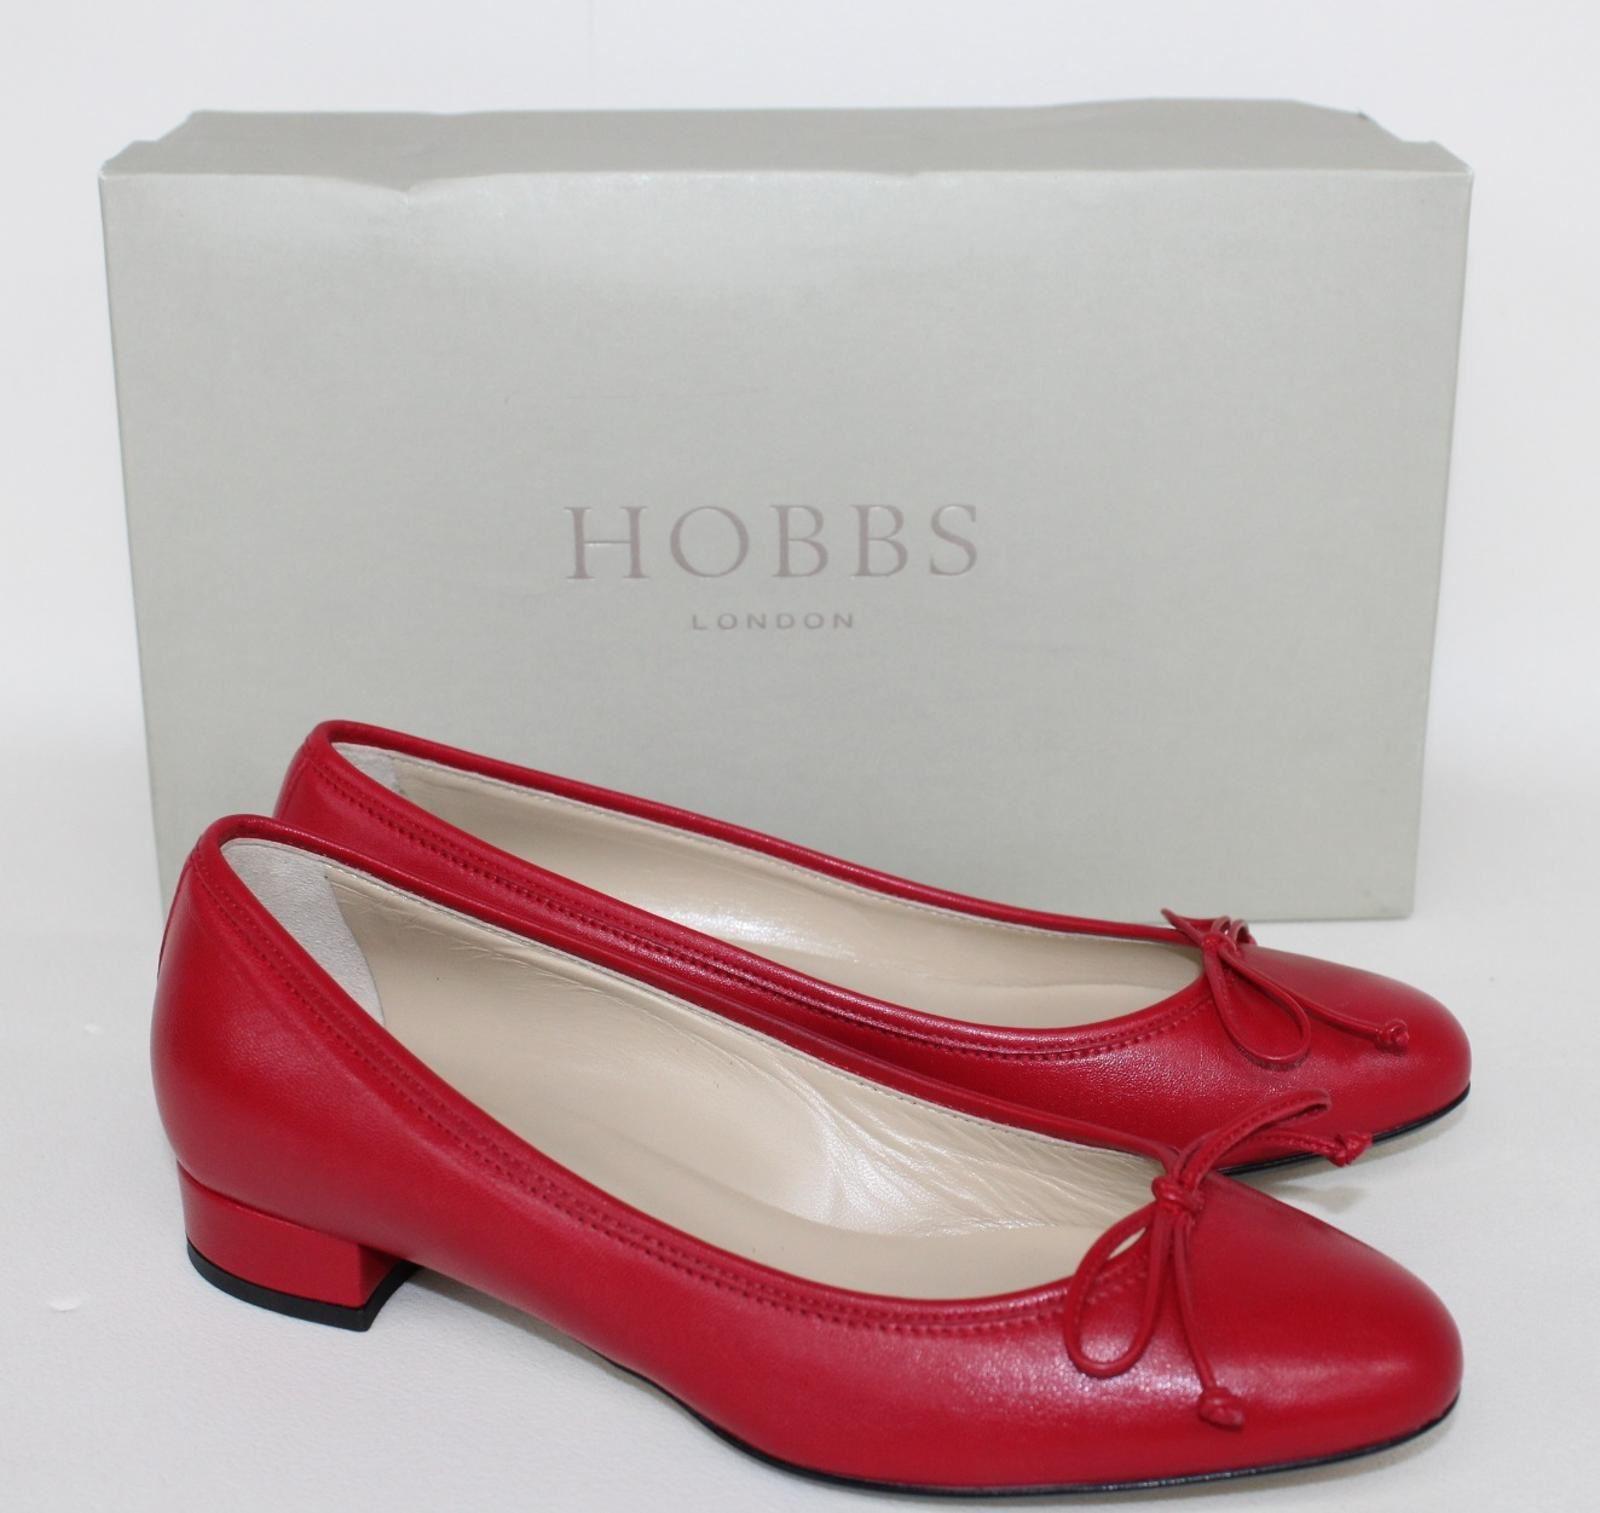 HOBBS-Ladies-Crimson-Red-Poppy-Shoe-Leather-Moccasin-Cuban-Heel-UK3-EU36-NEW